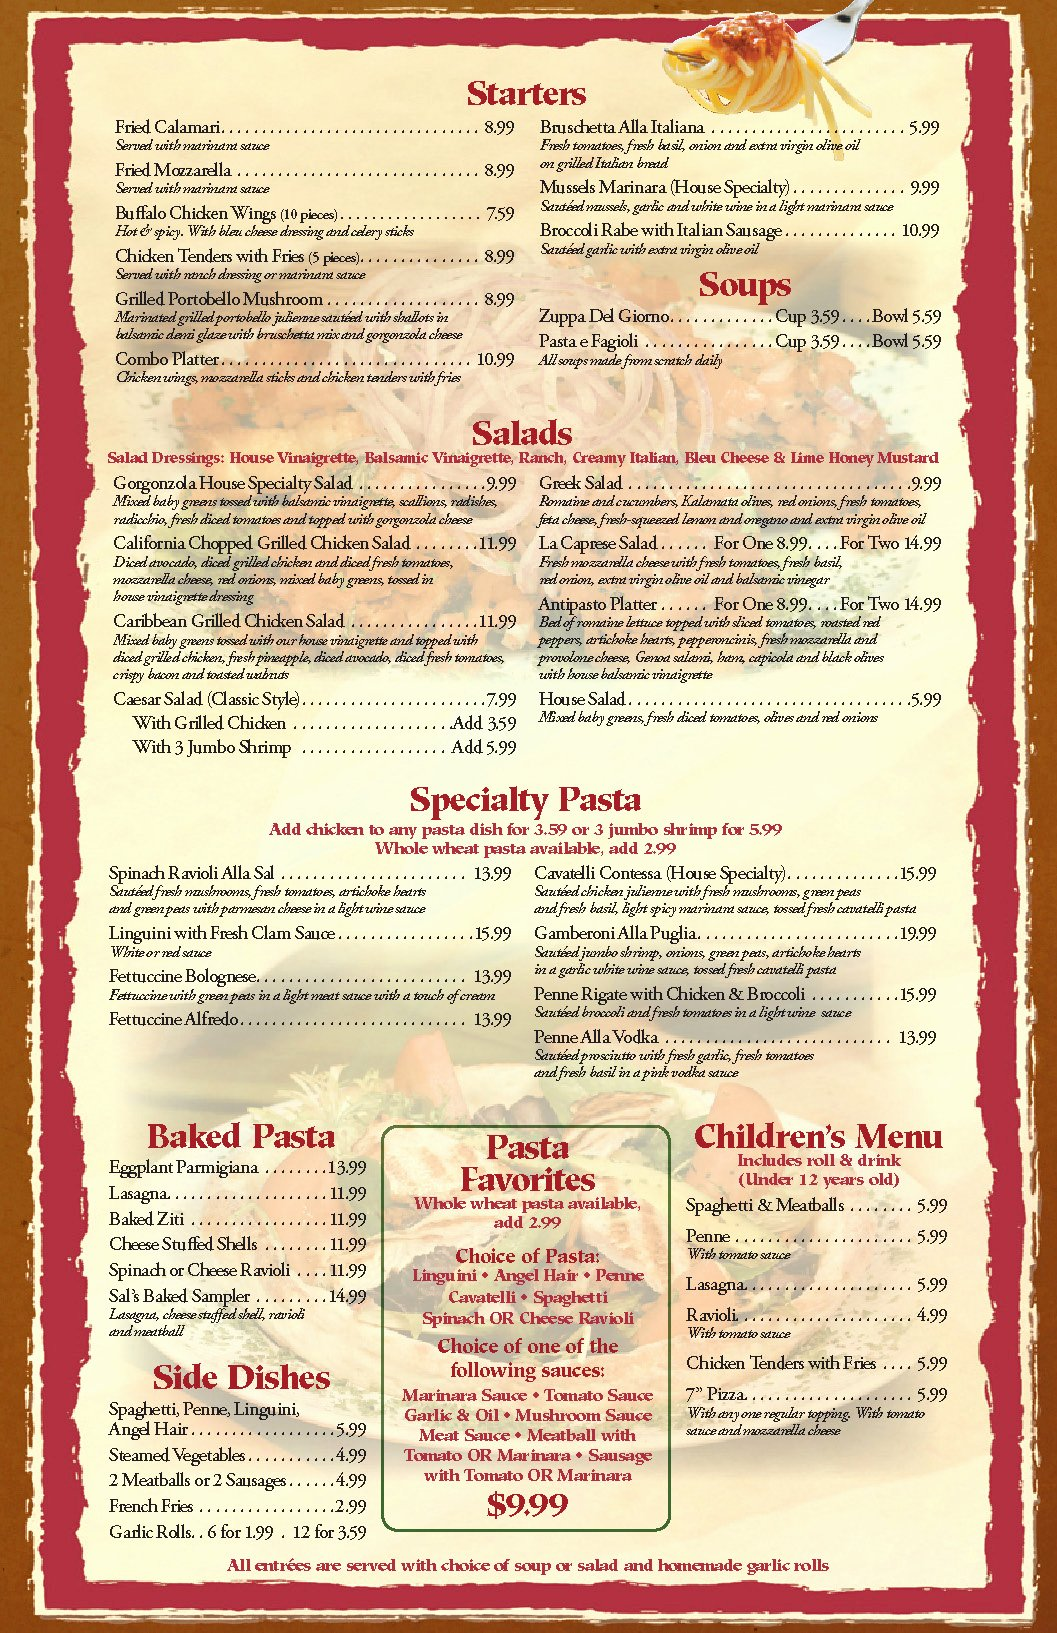 Catering Menu Template Free Awesome Restaurant Menu Templates